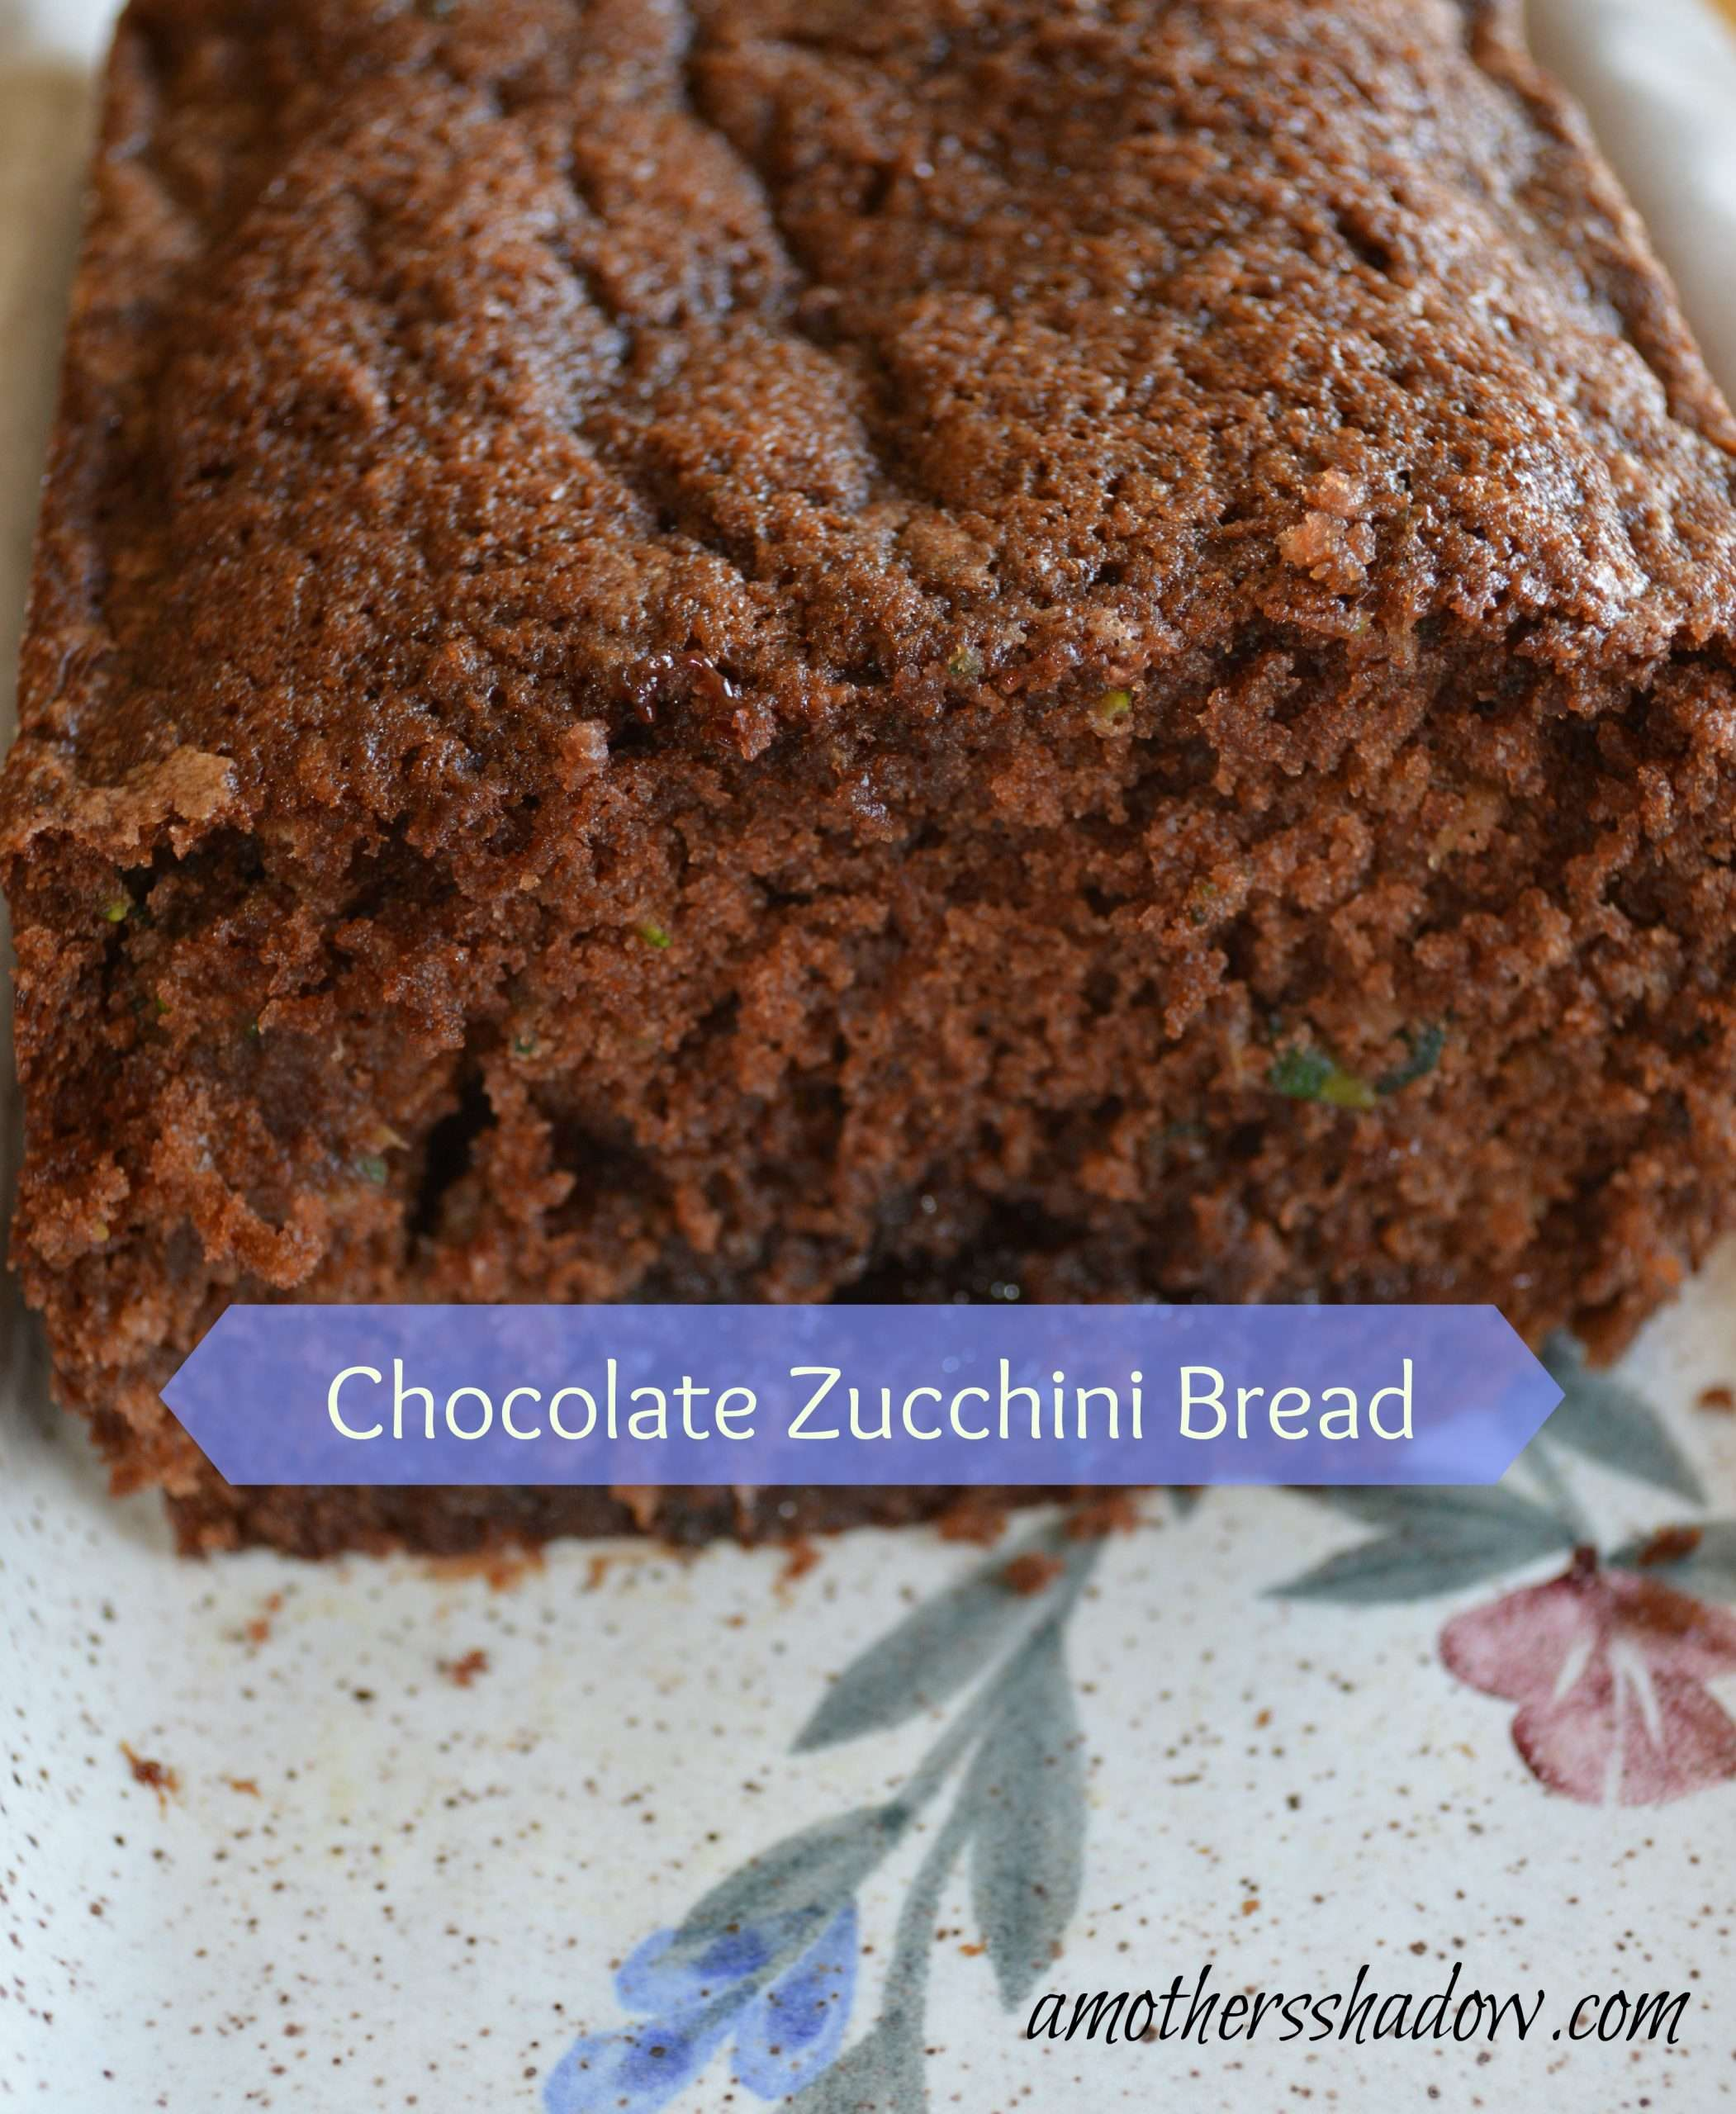 Best Ever Chocolate Zucchini Bread